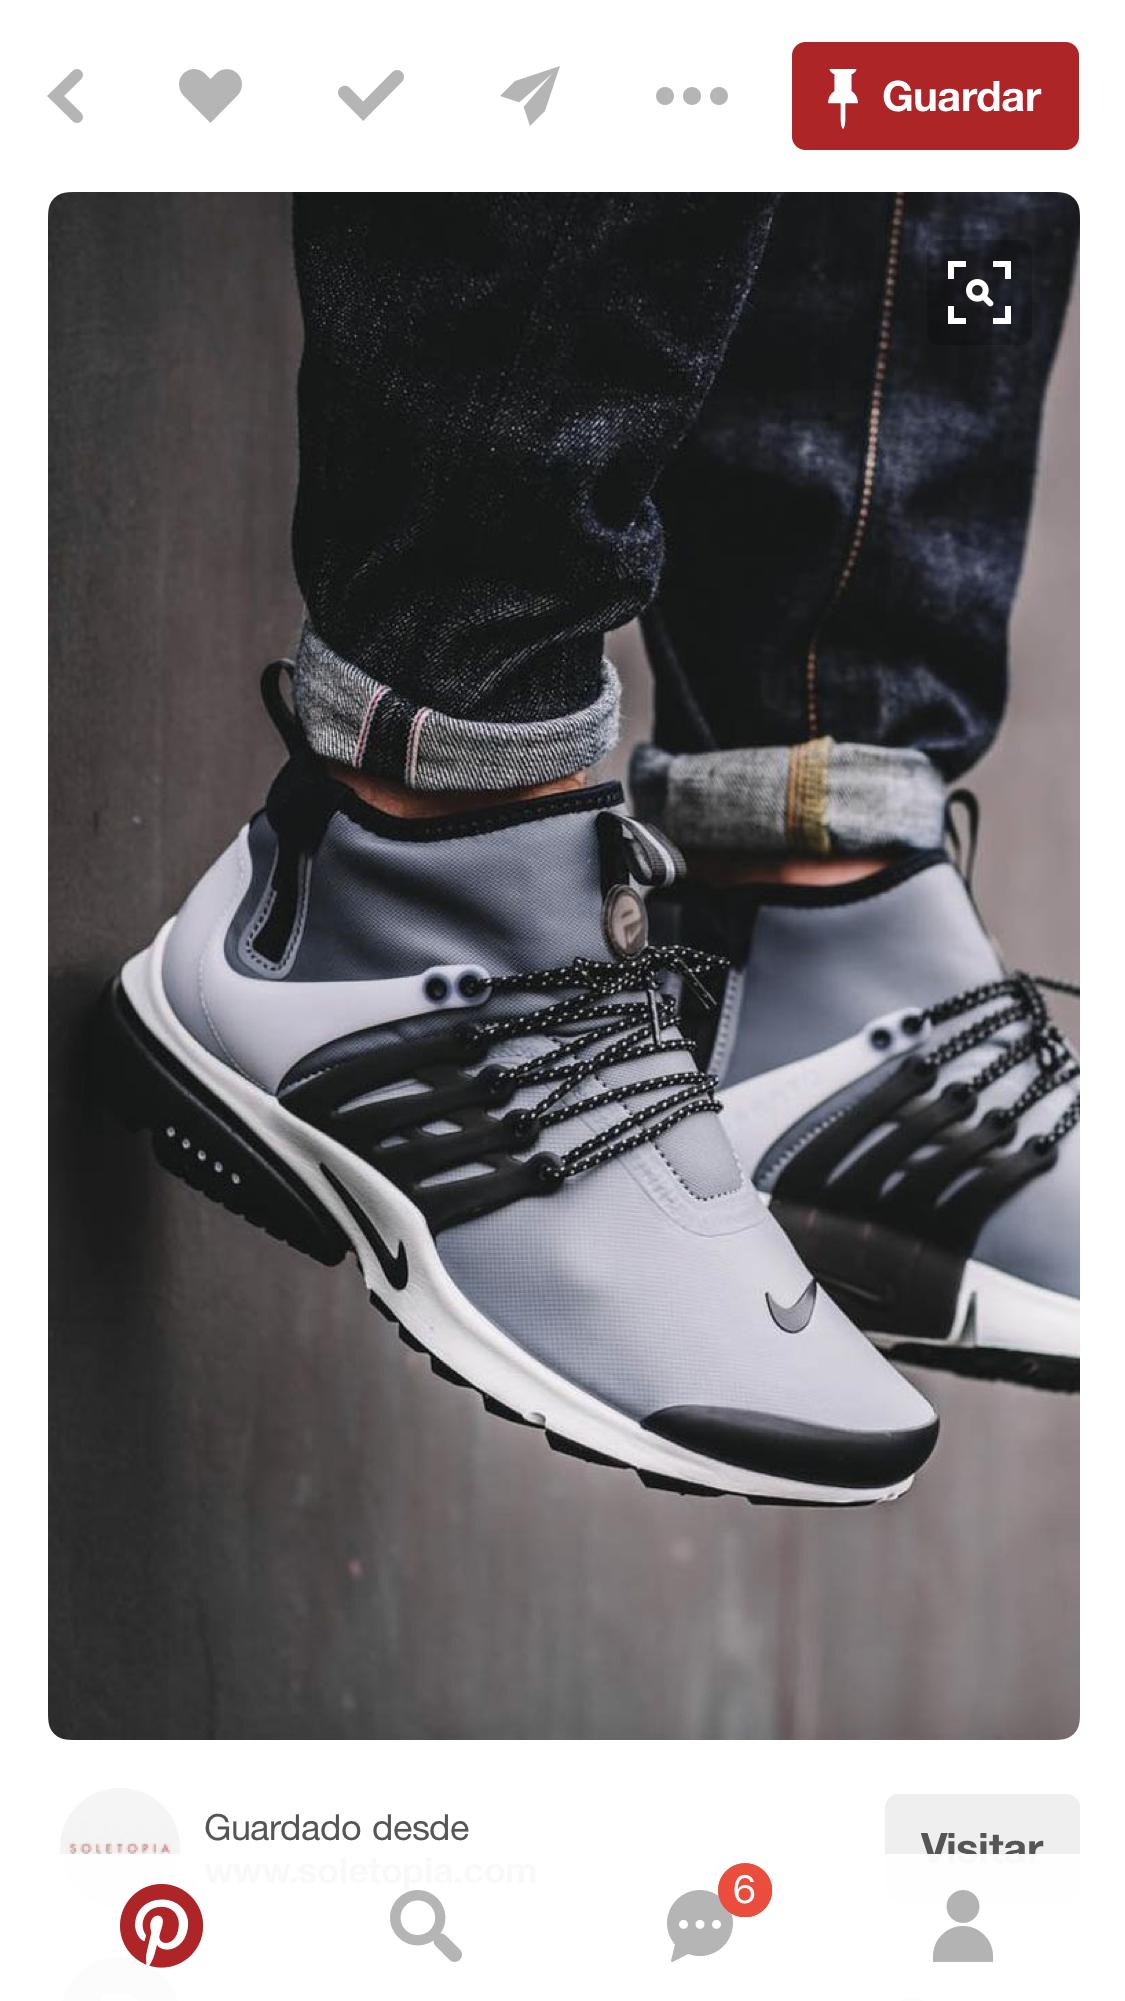 online store 23018 d1ae5 Scarpe Adidas, Scarpe Da Ginnastica Nike, Scarpe Da Ginnastica Moda, Scarpe  Di Moda